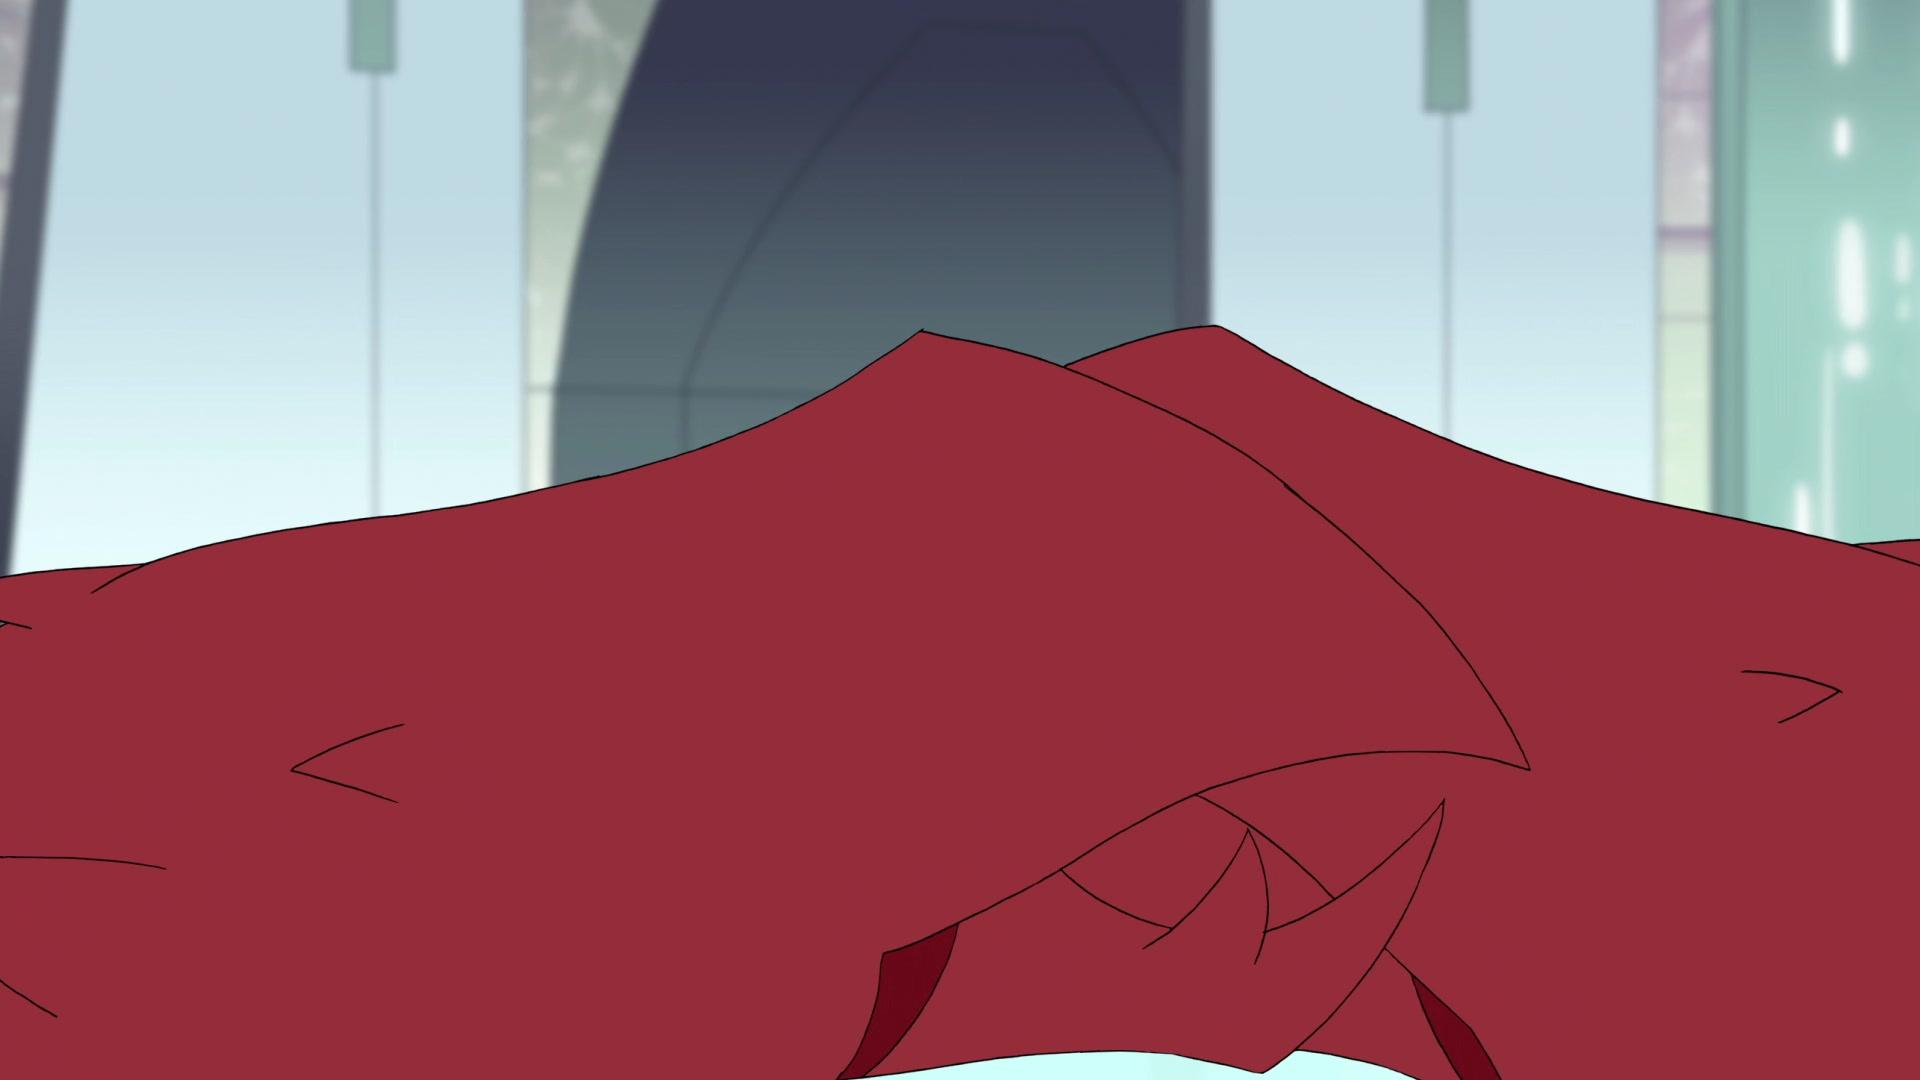 She-Ra and the Princesses of Power S05E13